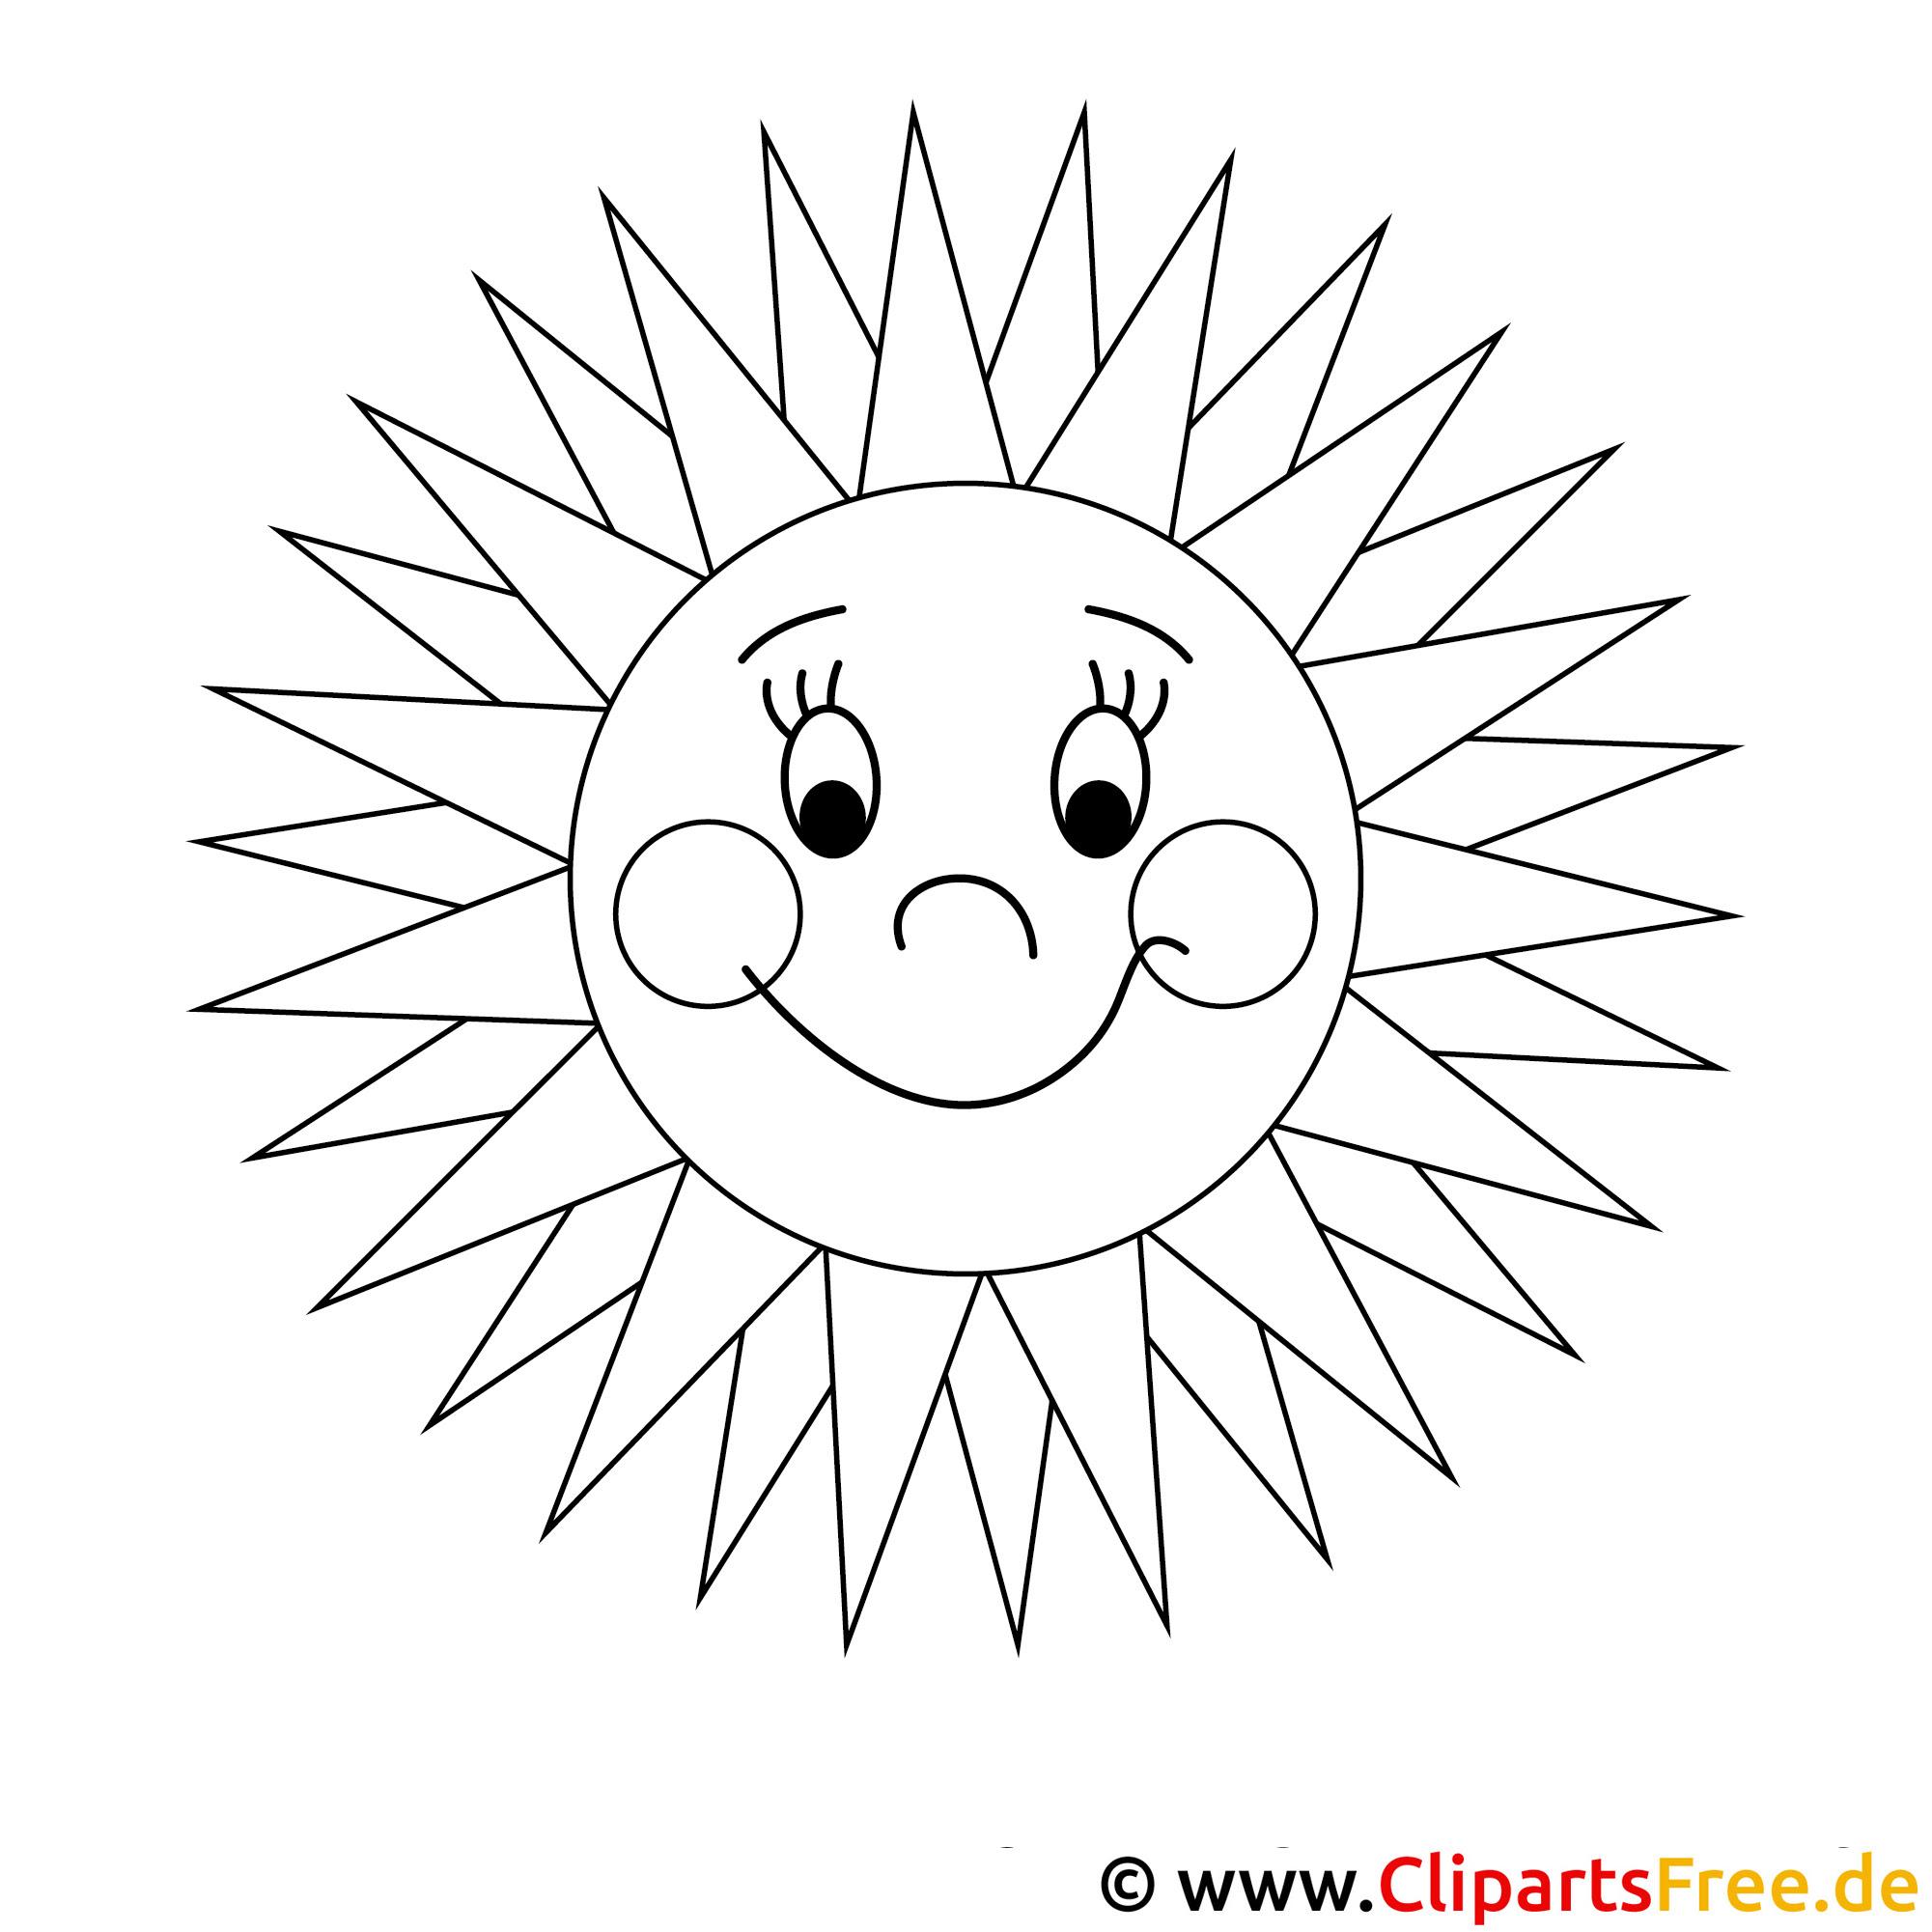 Sommer malvorlage Sonne Malvorlage